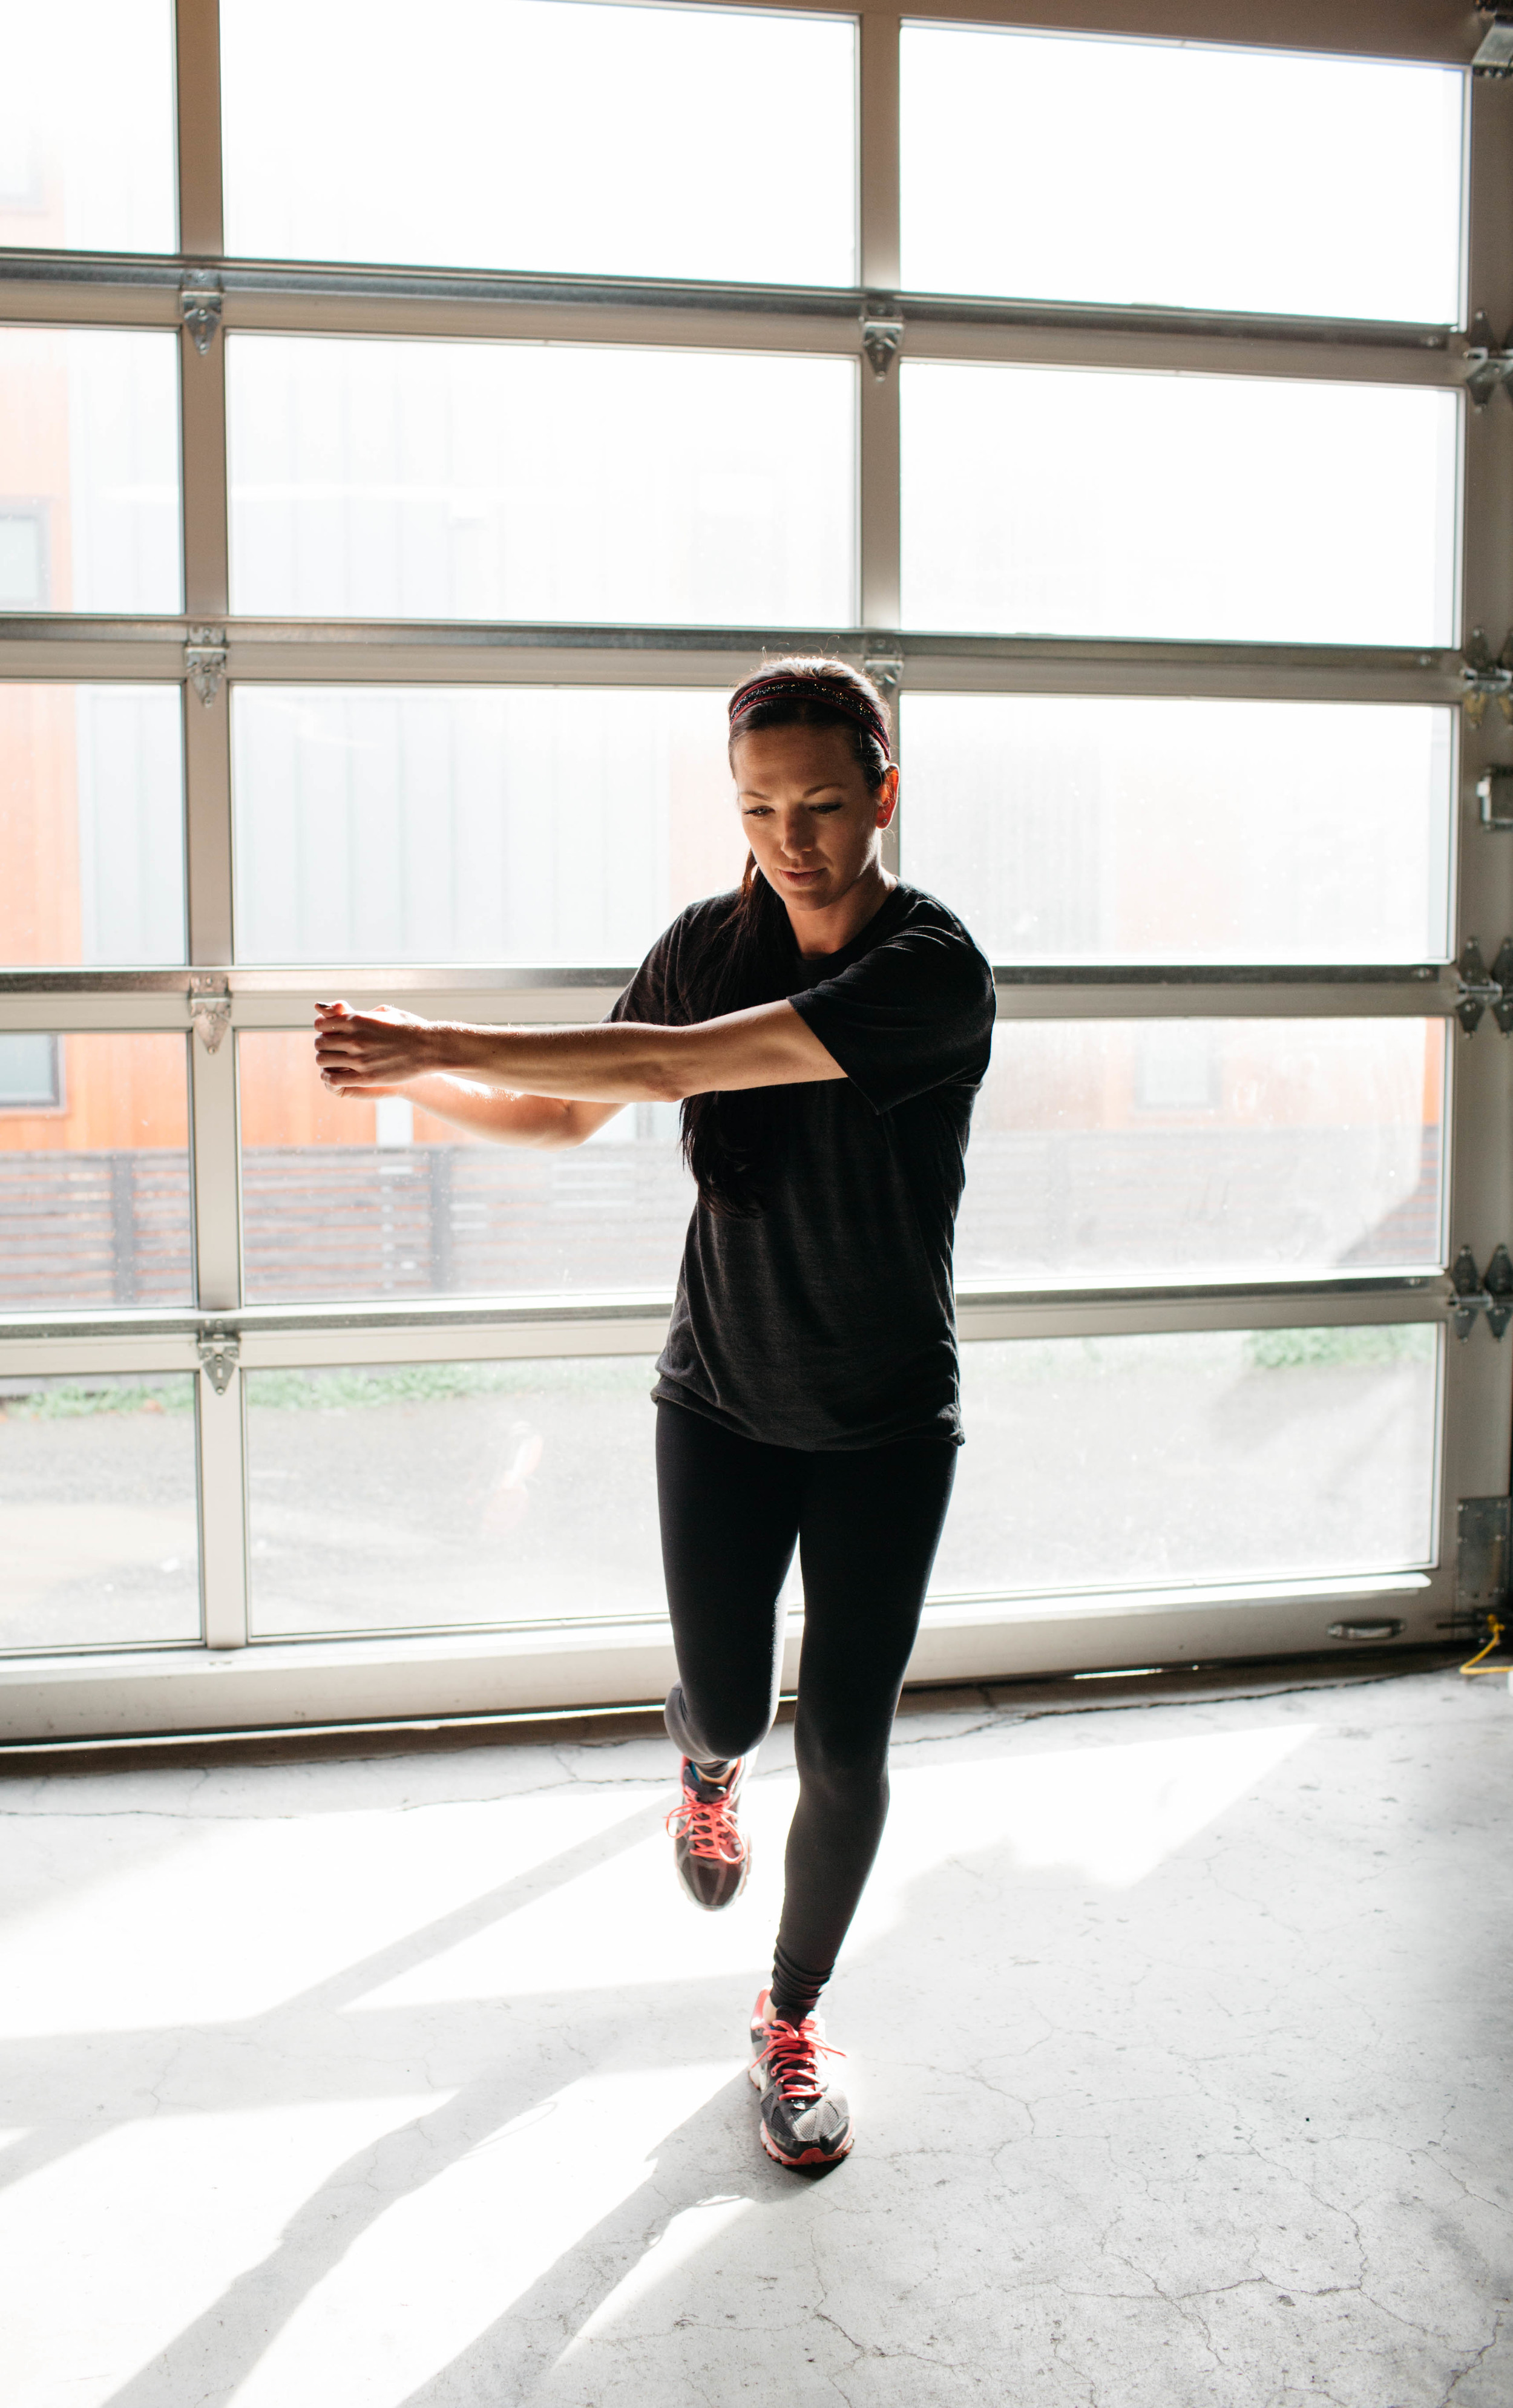 Single-Leg Balance with Trunk Rotation